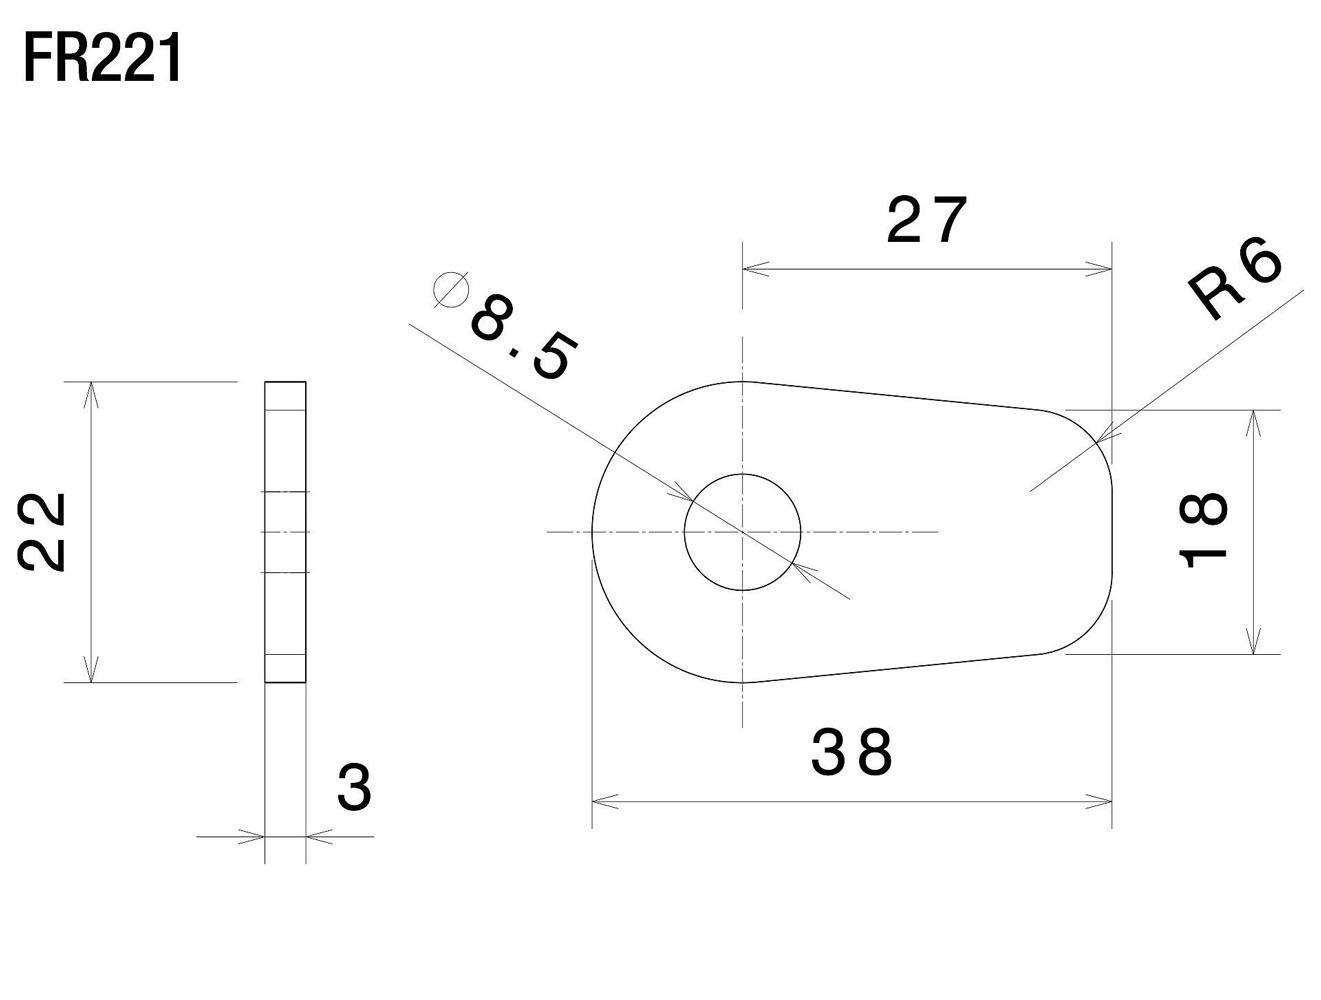 Piastrine Frecce Rizoma FR221B